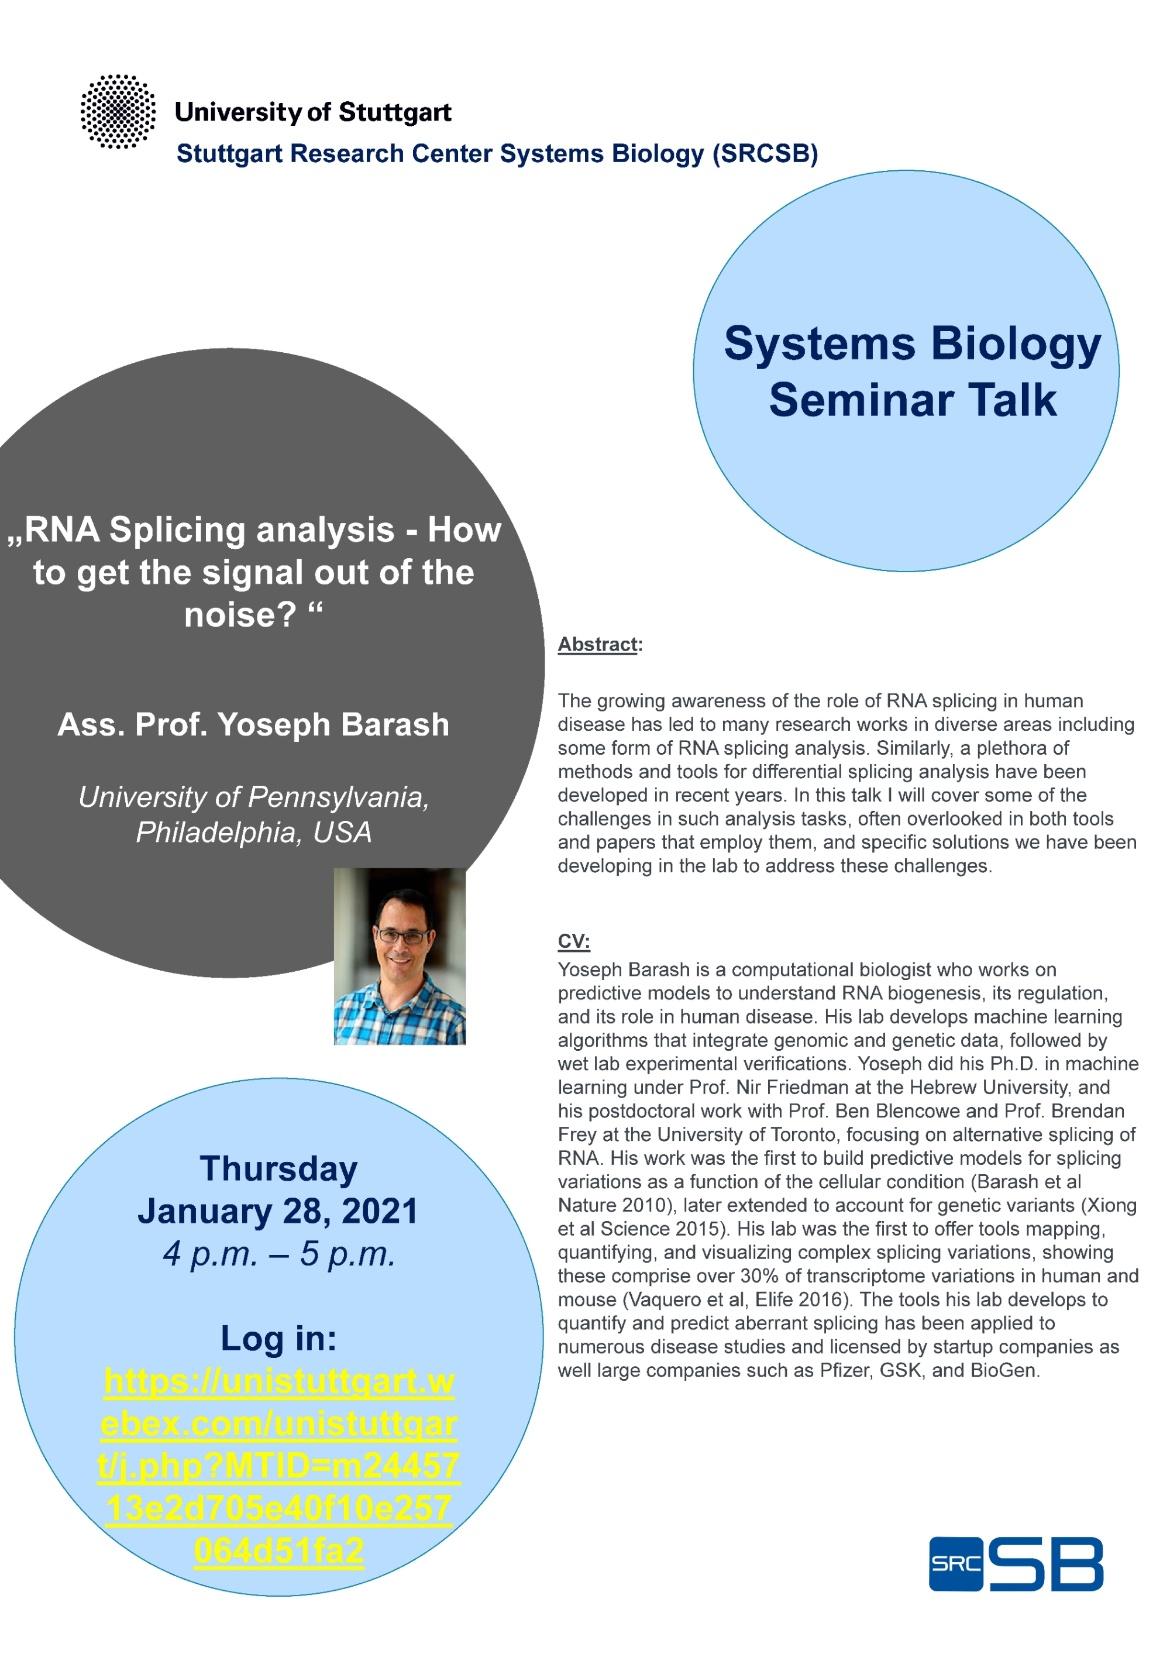 Announcement of the Talk of Ass. Prof. Yoseph Barash, University of Pennsylvania, USA